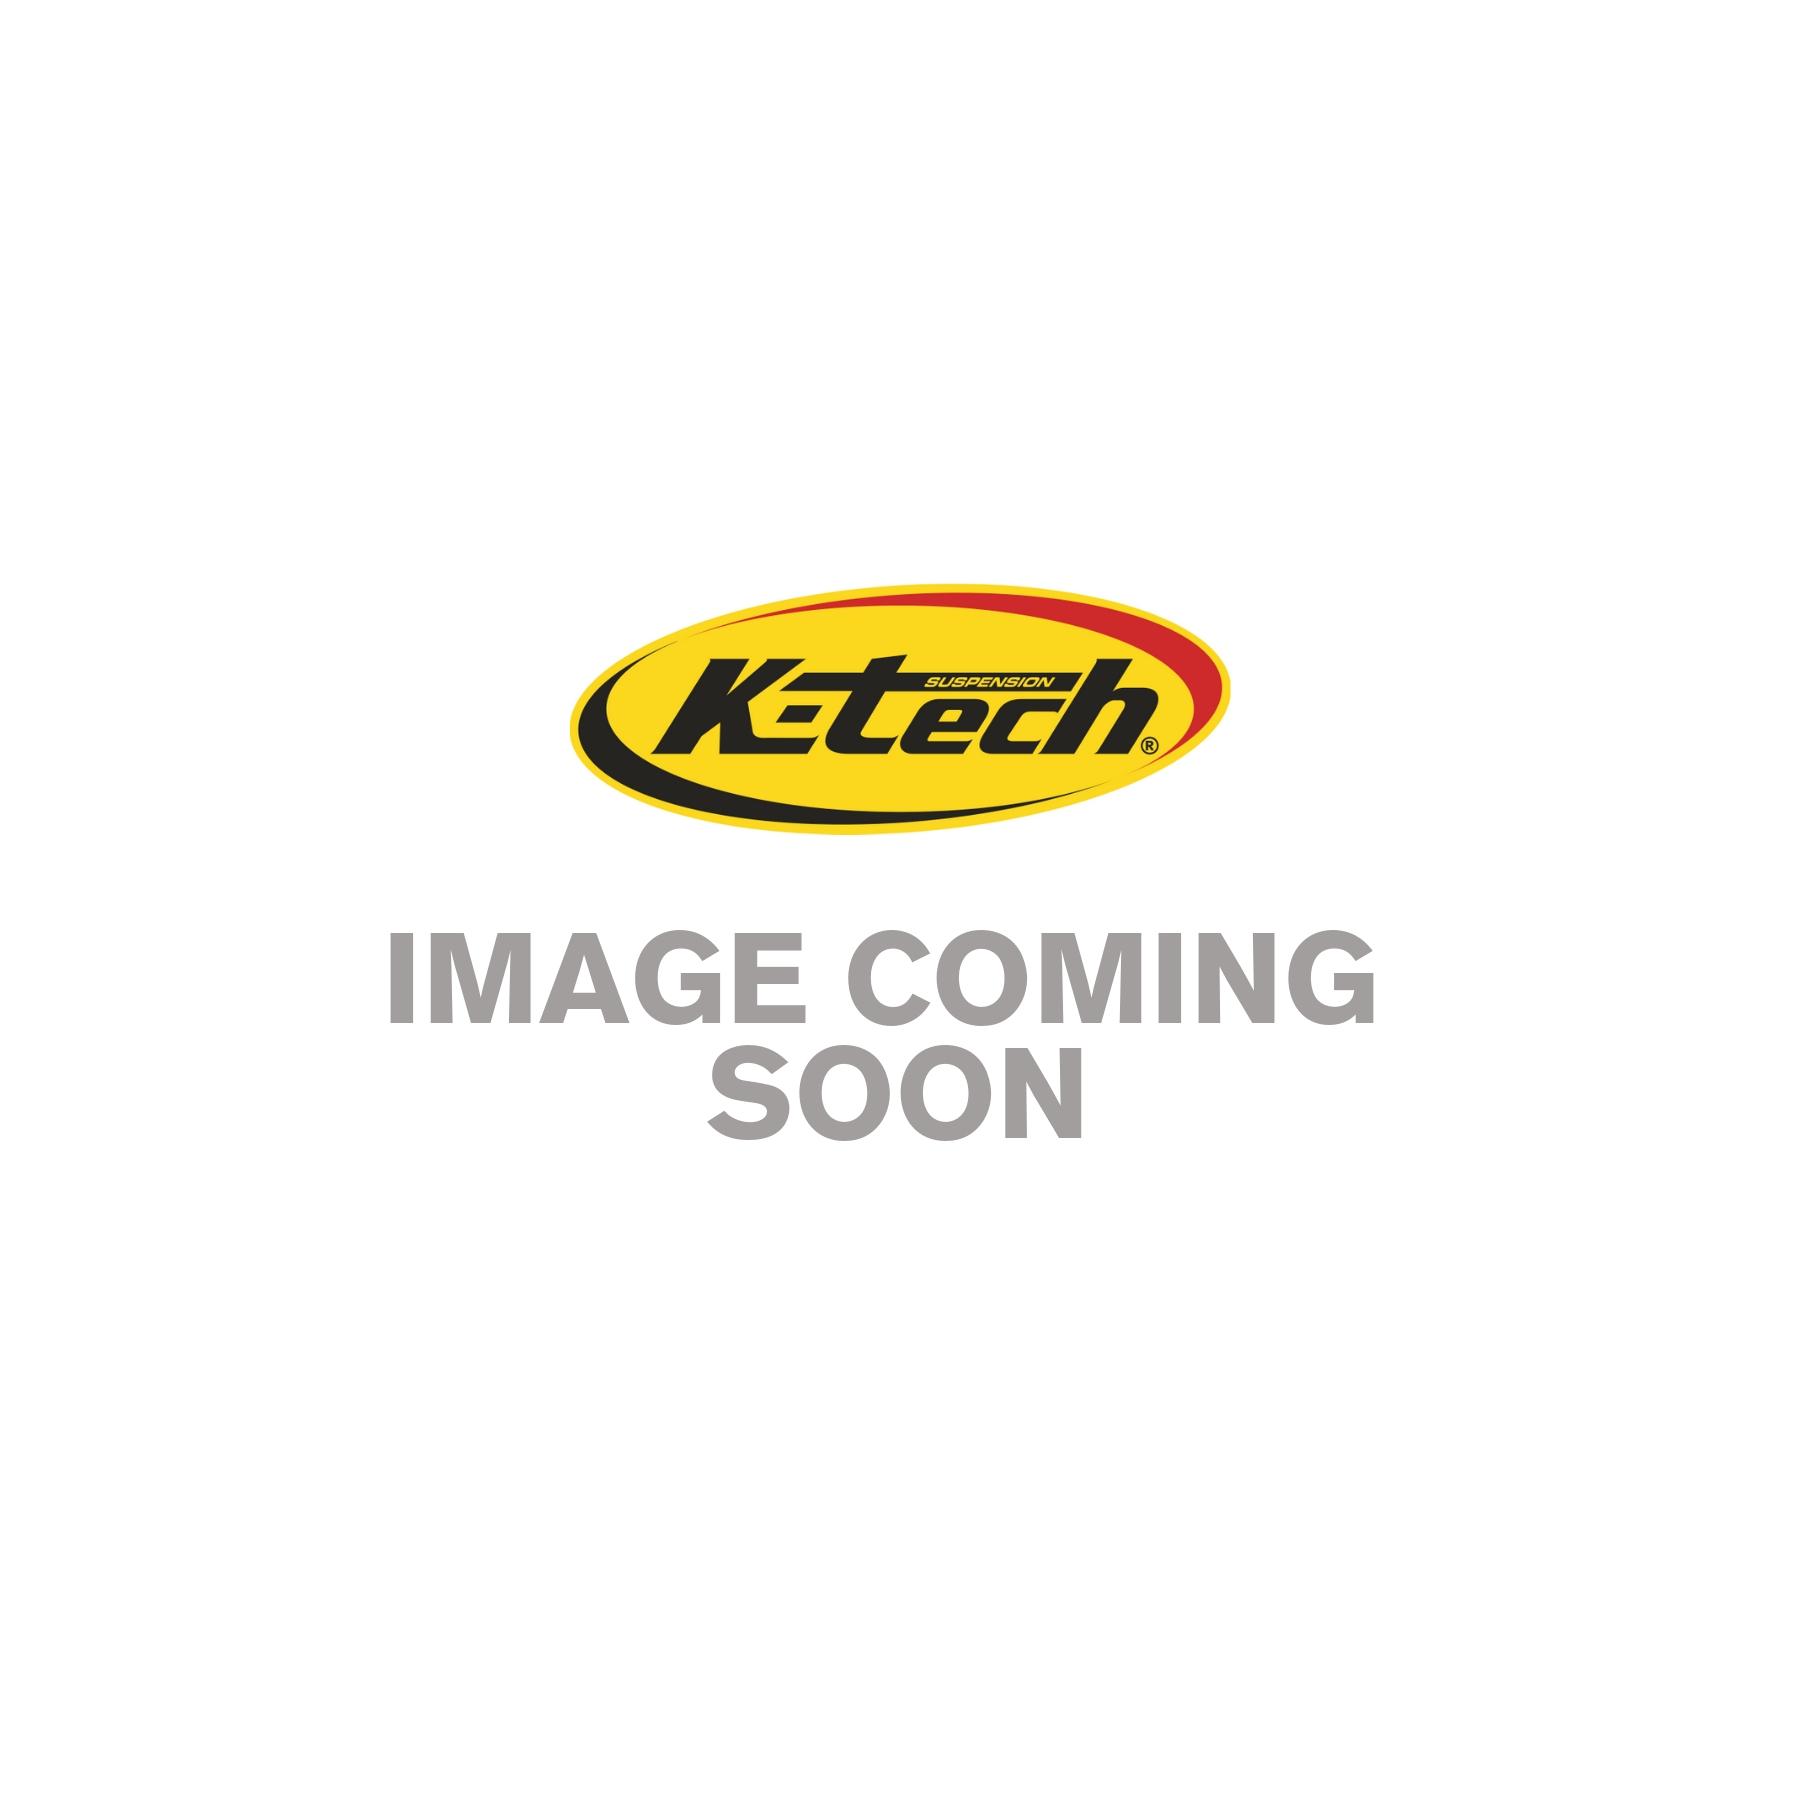 Shock Absorber Spring Jack Insert -(77.5x70.5x65.0) K-Tech DDS